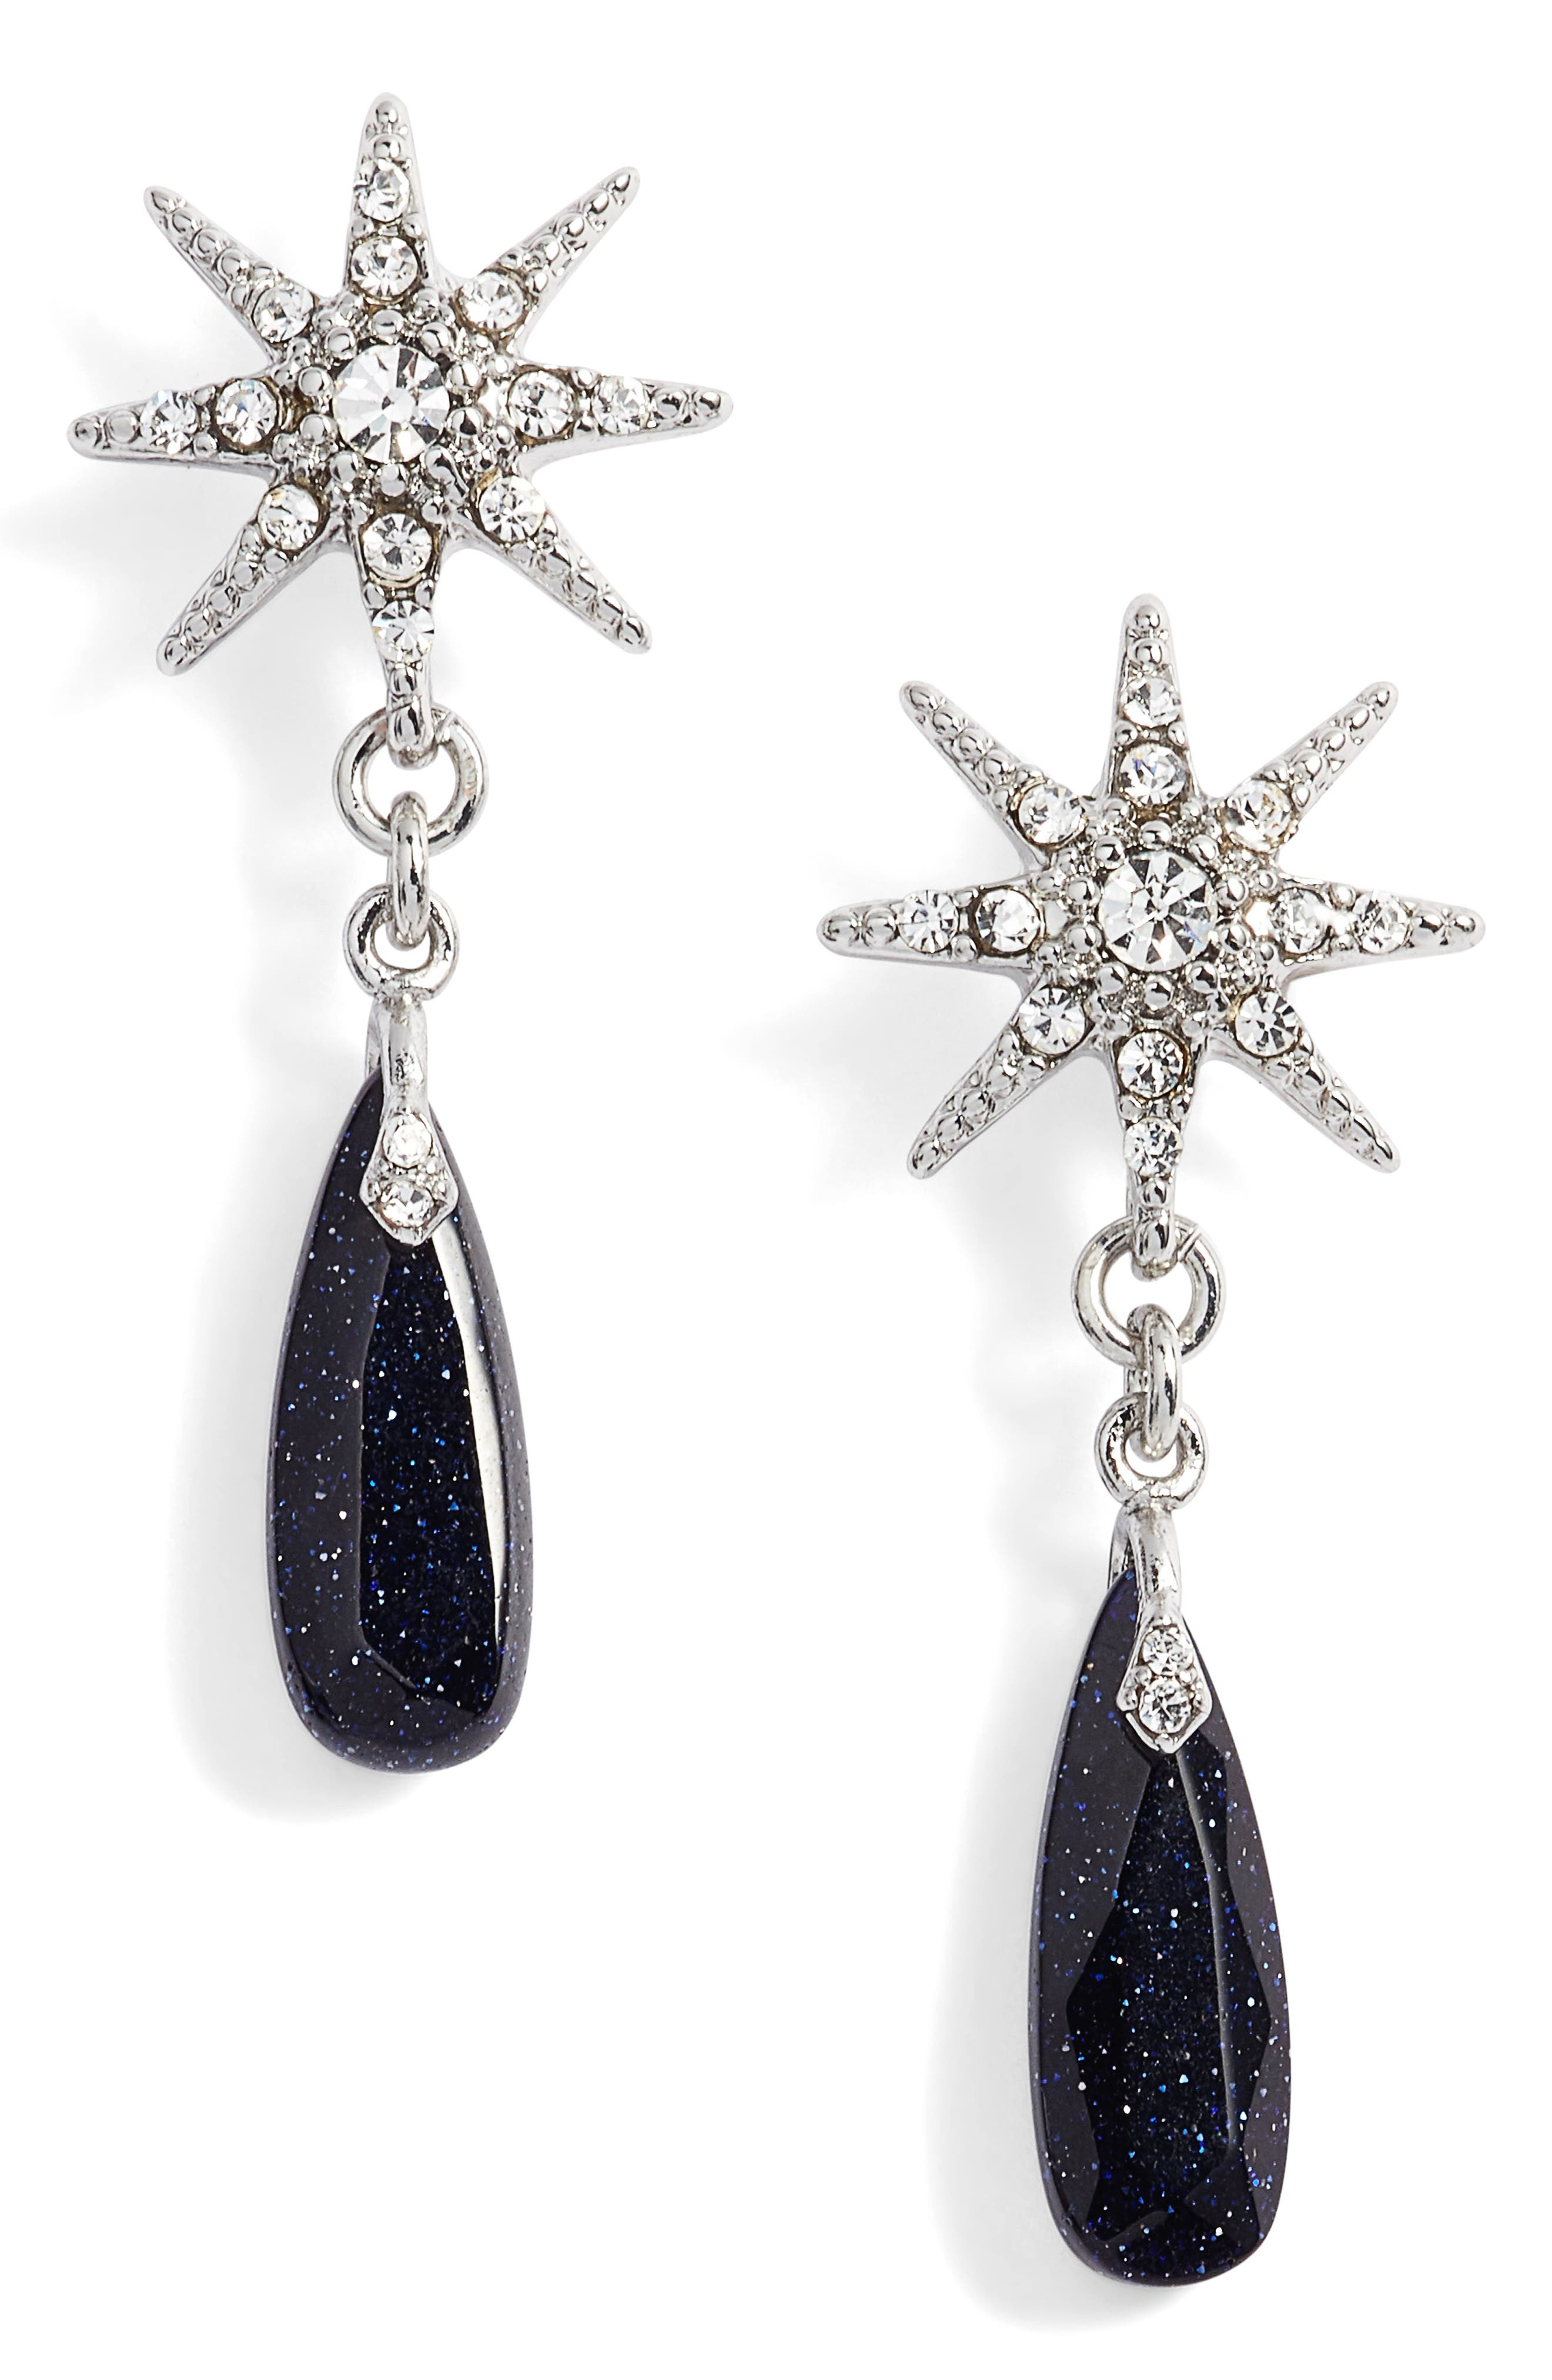 Imitation Pearl Drop Earrings,                             Main thumbnail 1, color,                             Silver/ Cry/ Blue